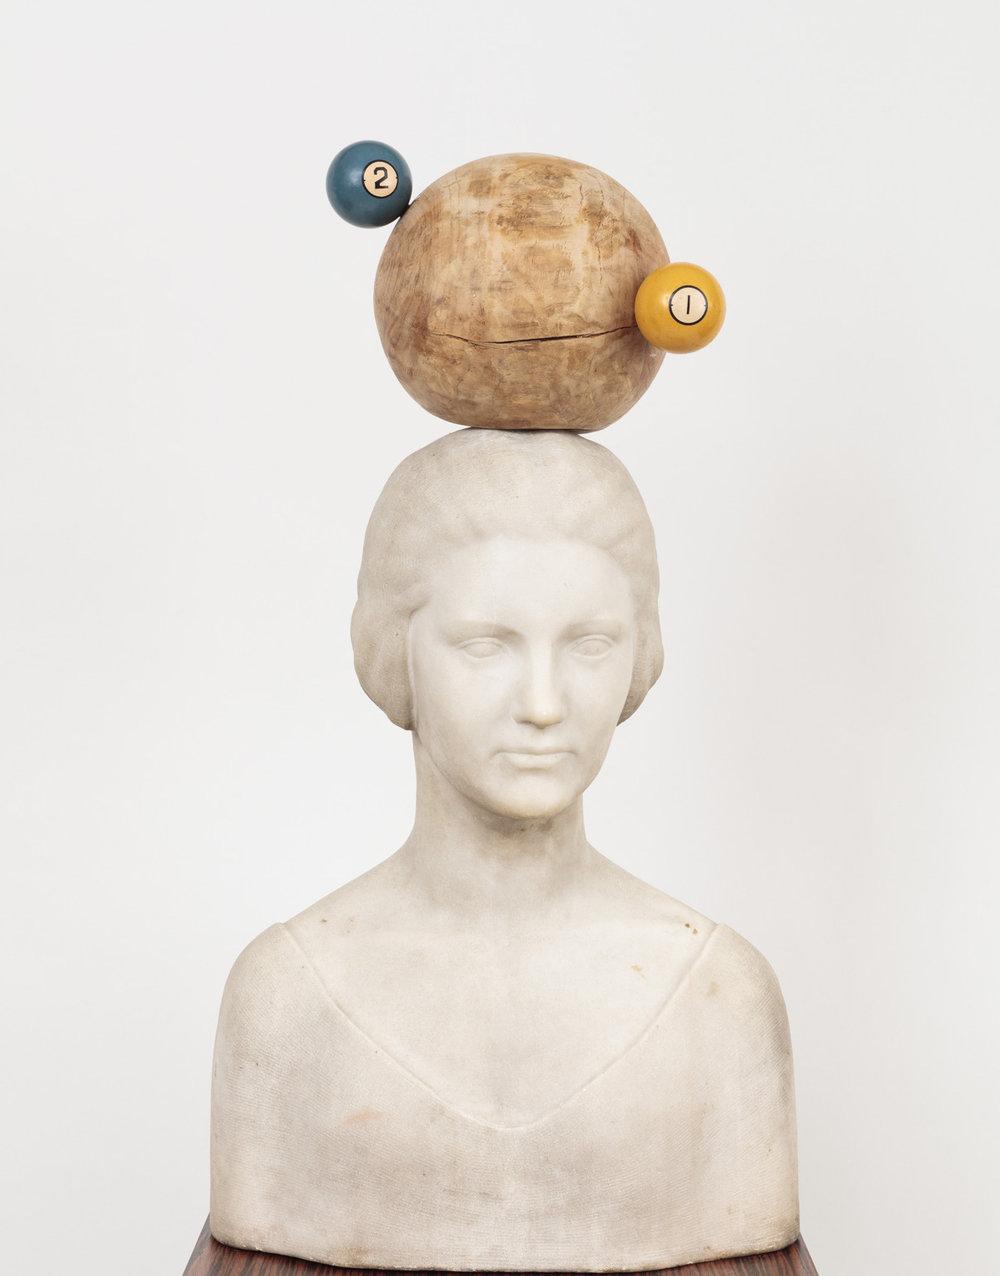 Alexis Zambrano, Thinker, 2017. Marble bust, wood, bakelite, 73.6 x 40.6 x 17.7 cm. (29 x 16 x 7 in.)